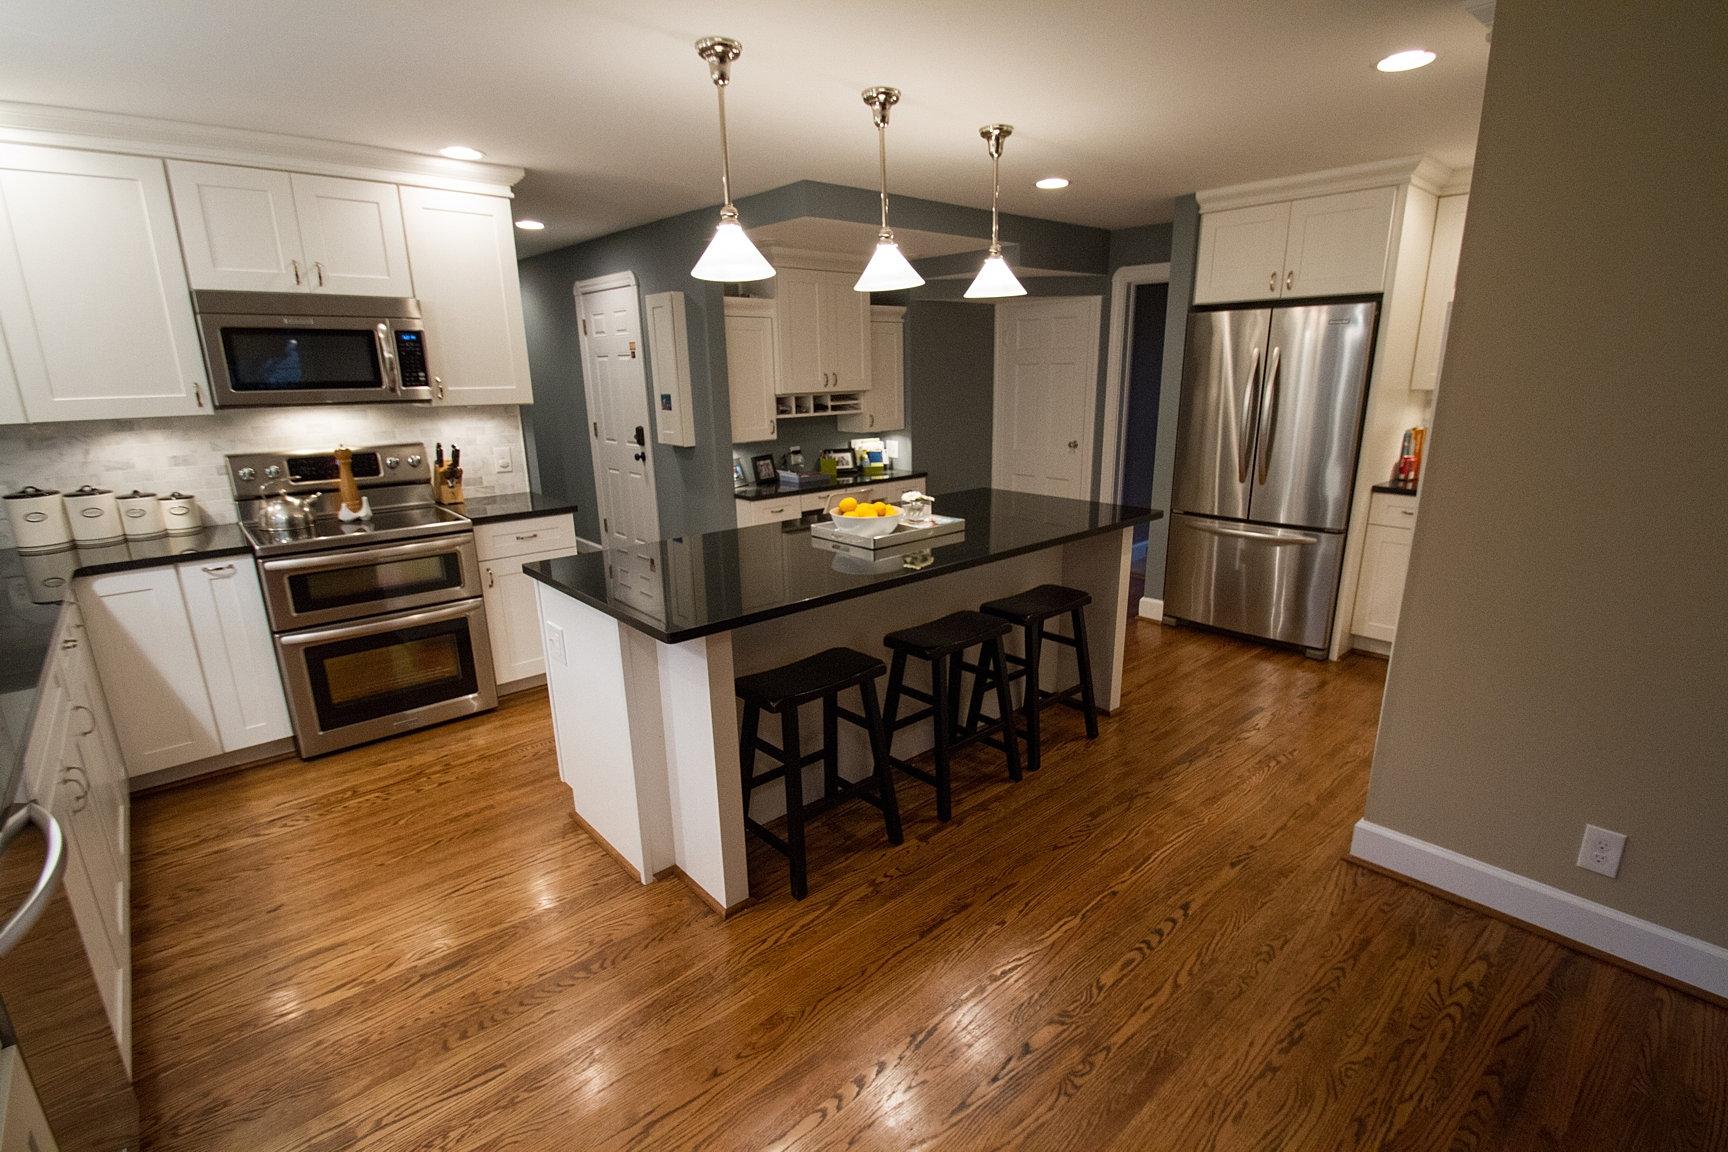 lightbox image1sen kitchen remodeling rochester ny Award Winning Kitchen Remodeling in Rochester NY